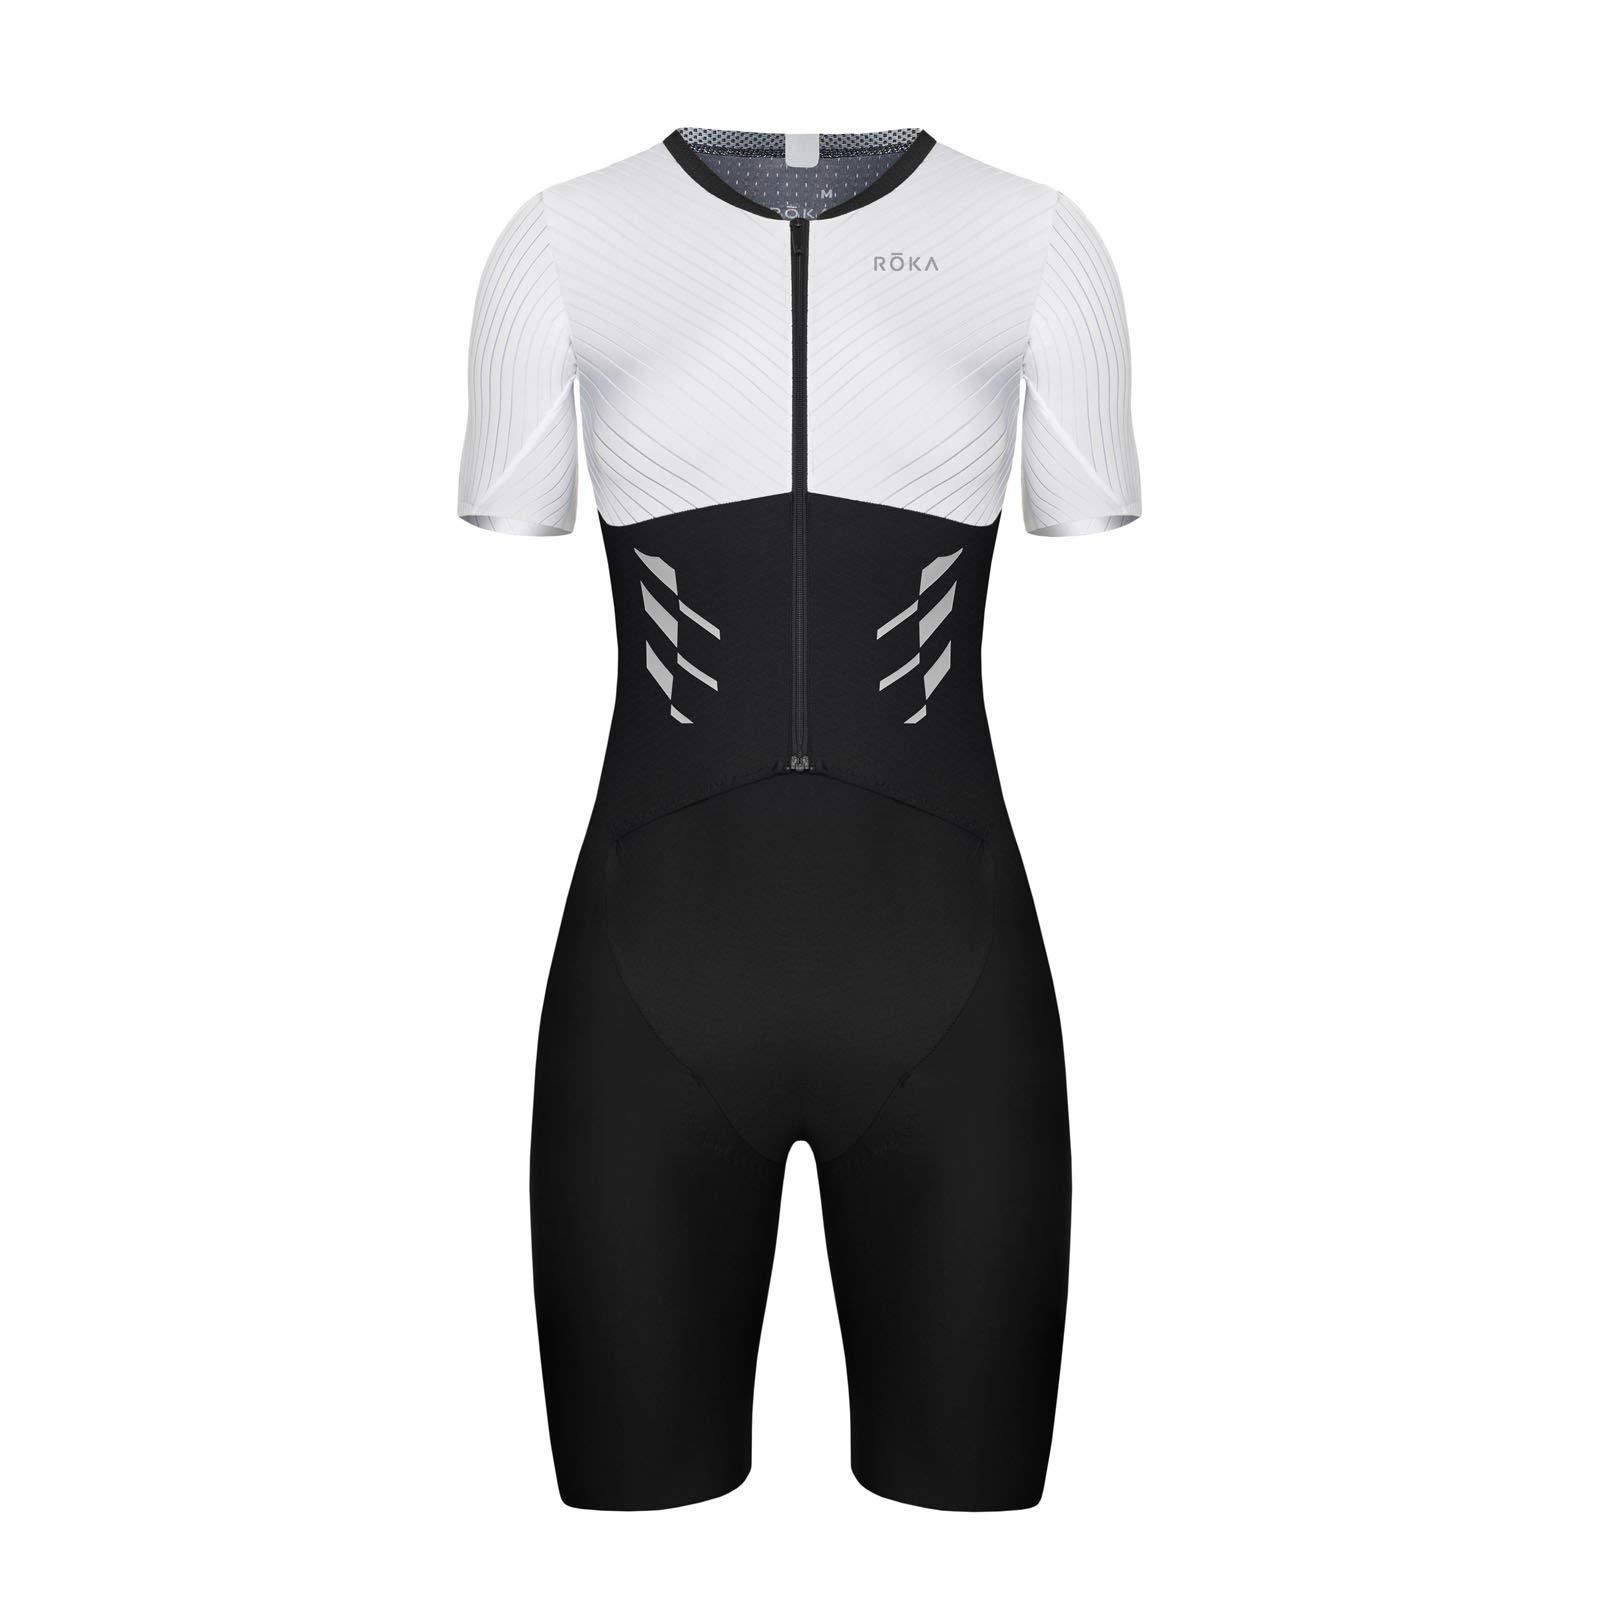 ROKA Women's Gen II Elite Aero Short Sleeve Triathlon Sport Suit - White/Black - X-Small